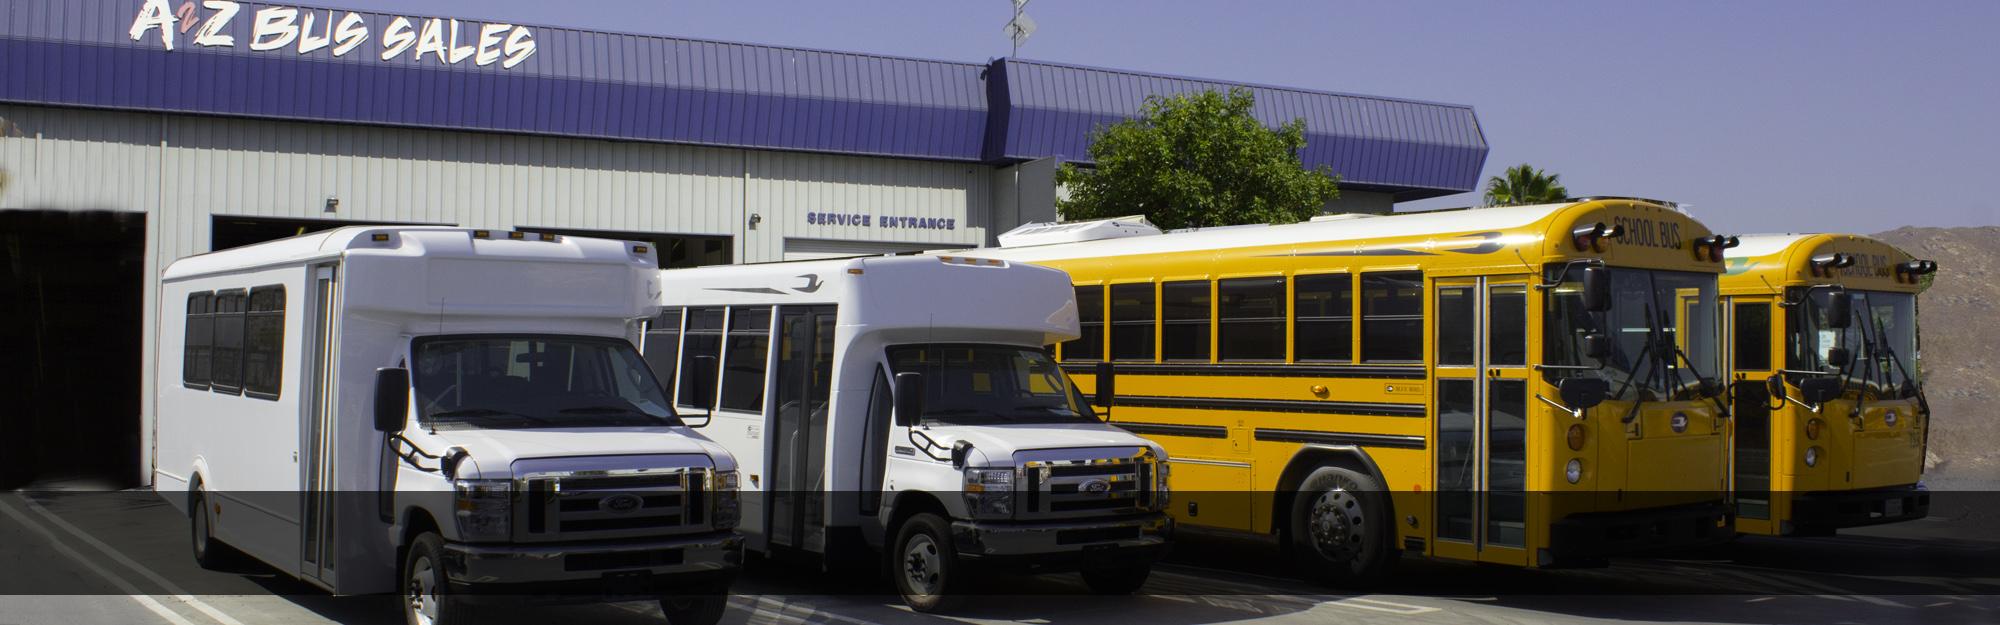 A-Z Bus Sales Warranty Information